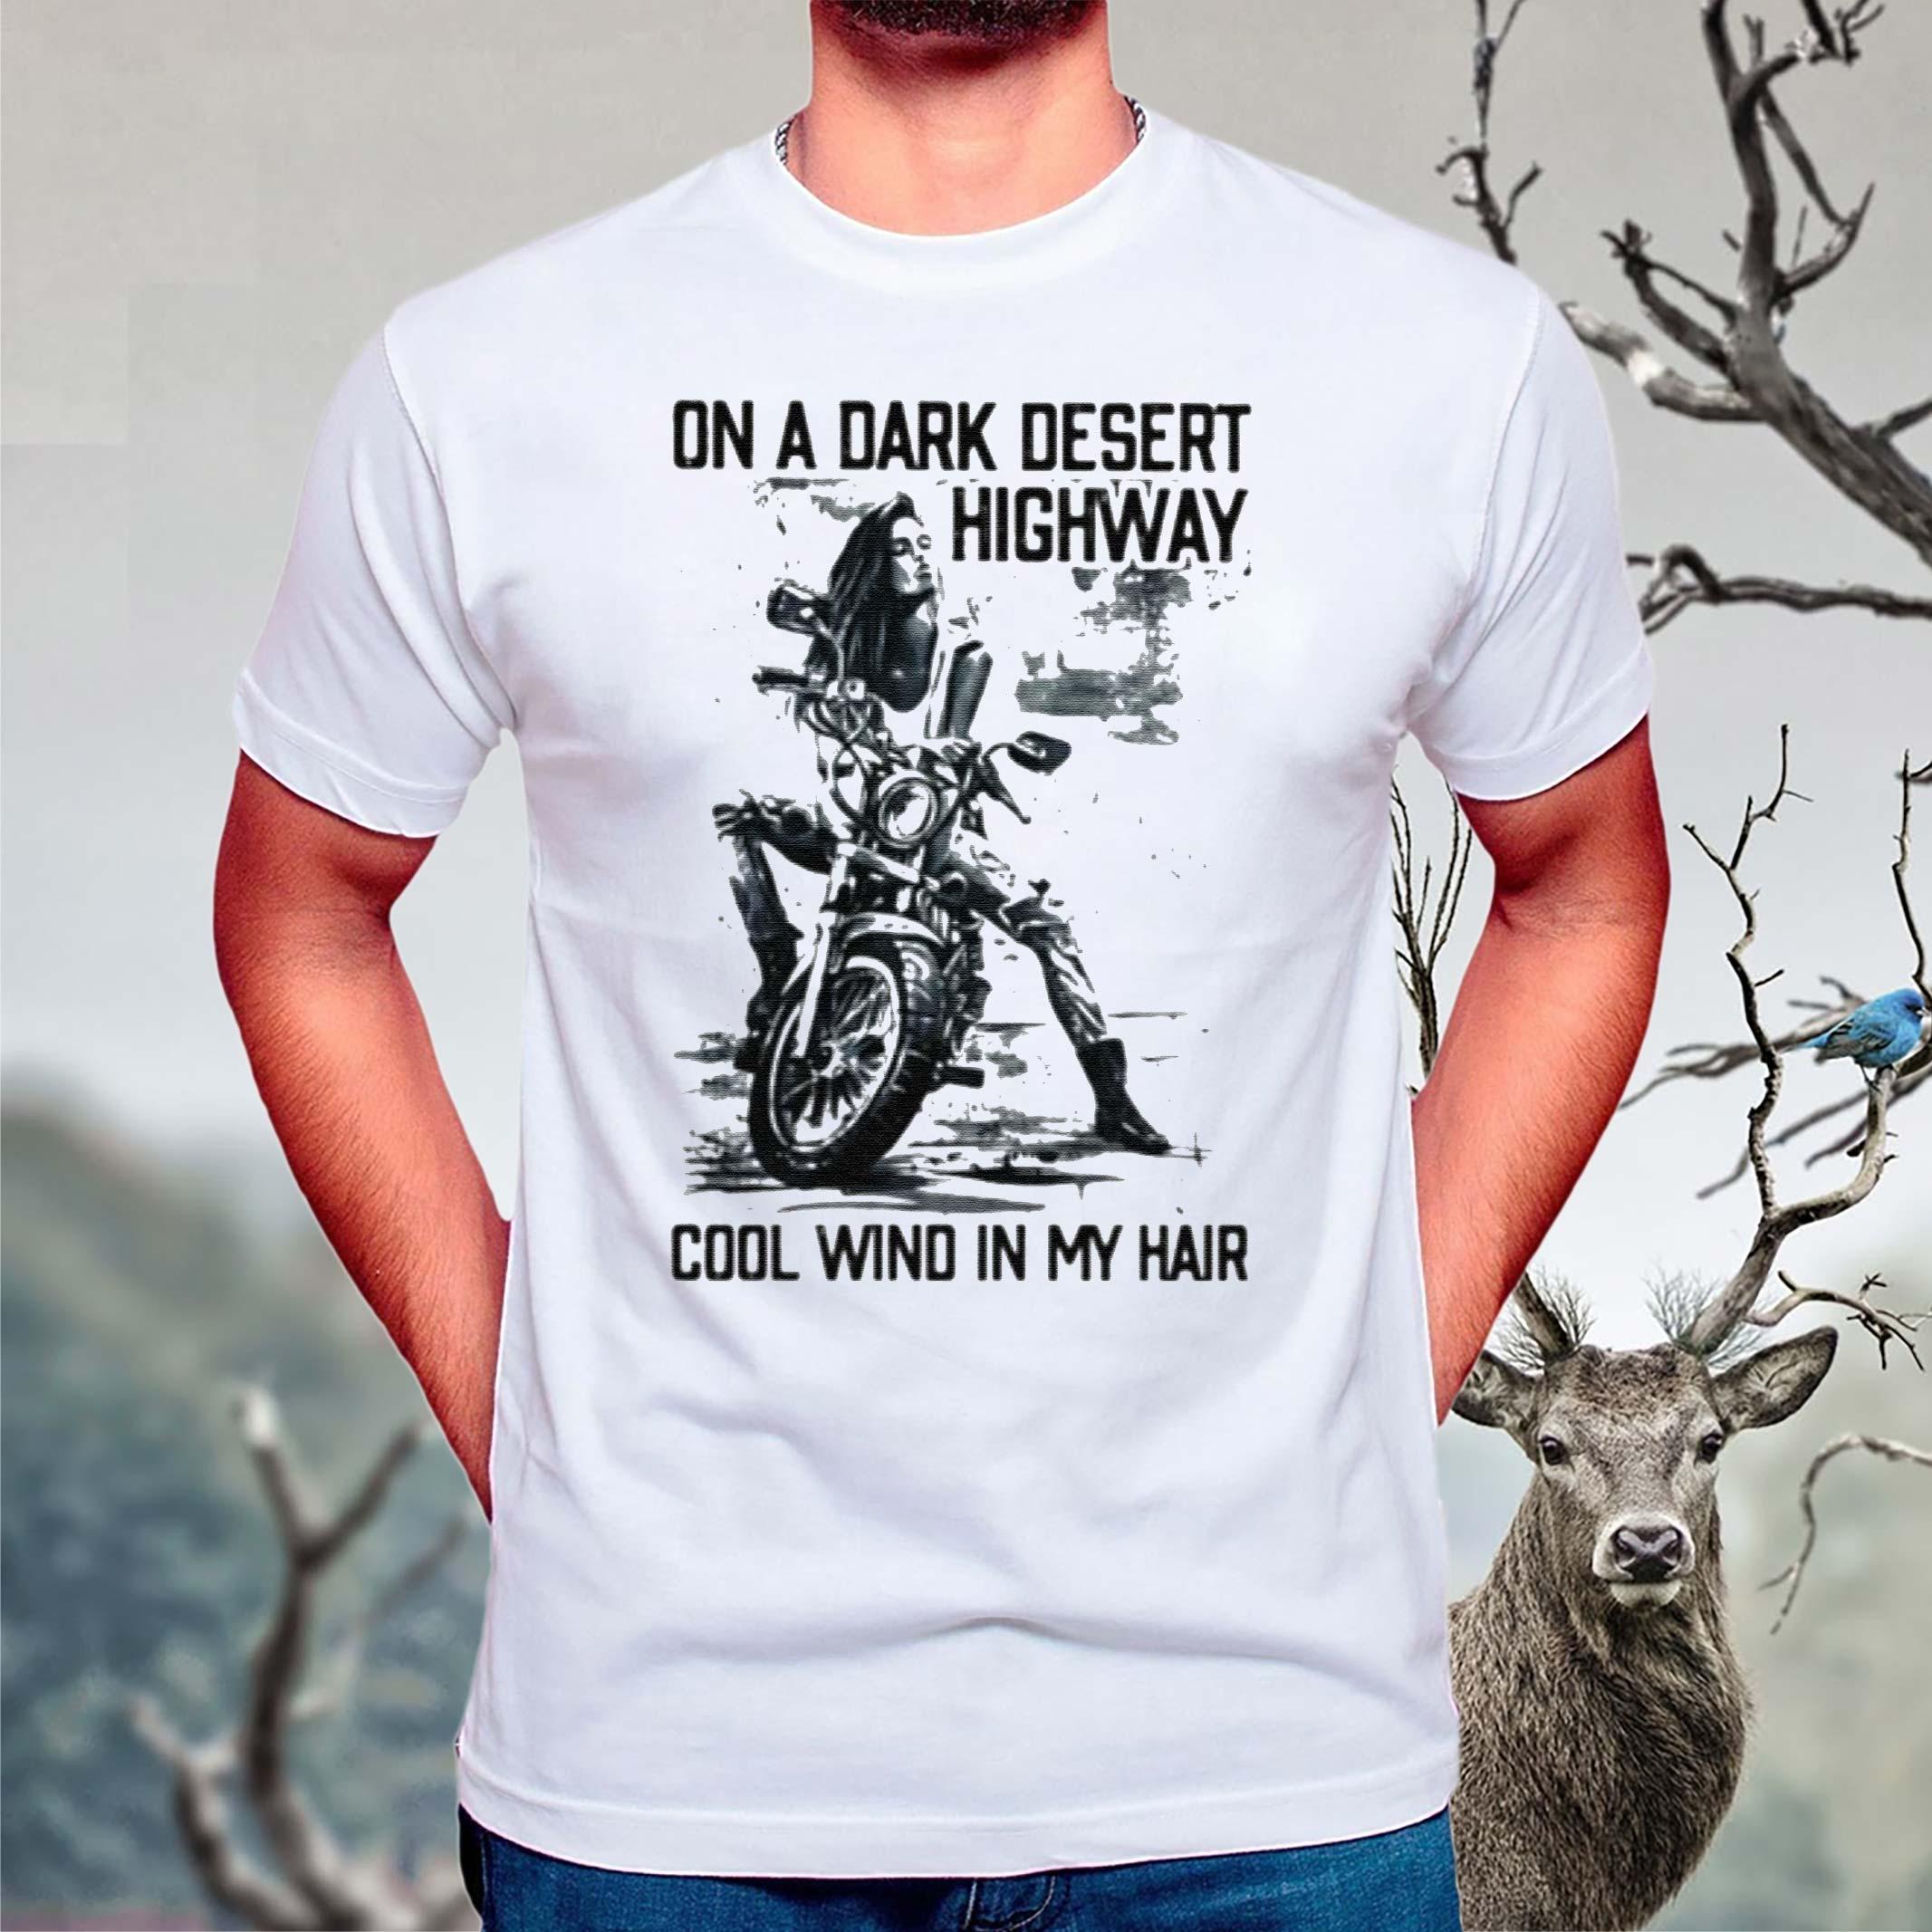 Motor-on-a-dark-desert-highway-cool-wind-in-my-hair-shirts